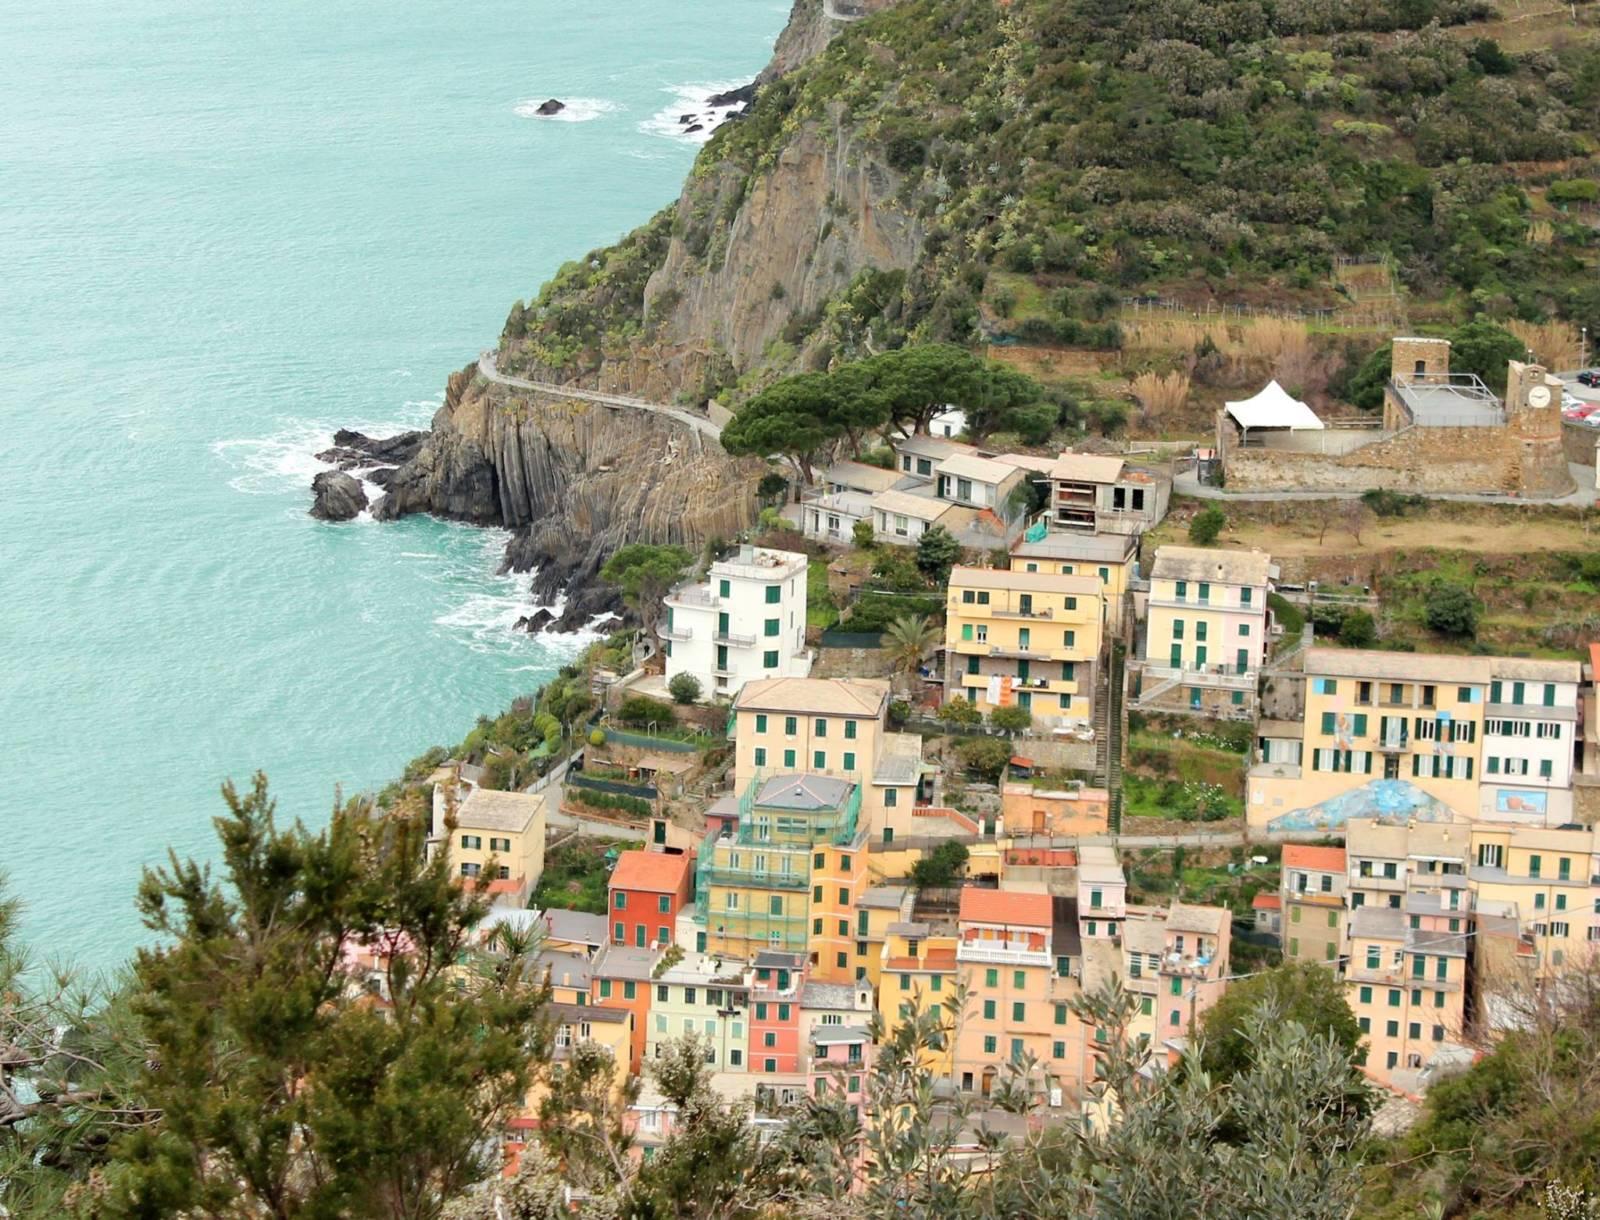 Budget Travel in Cinque Terre